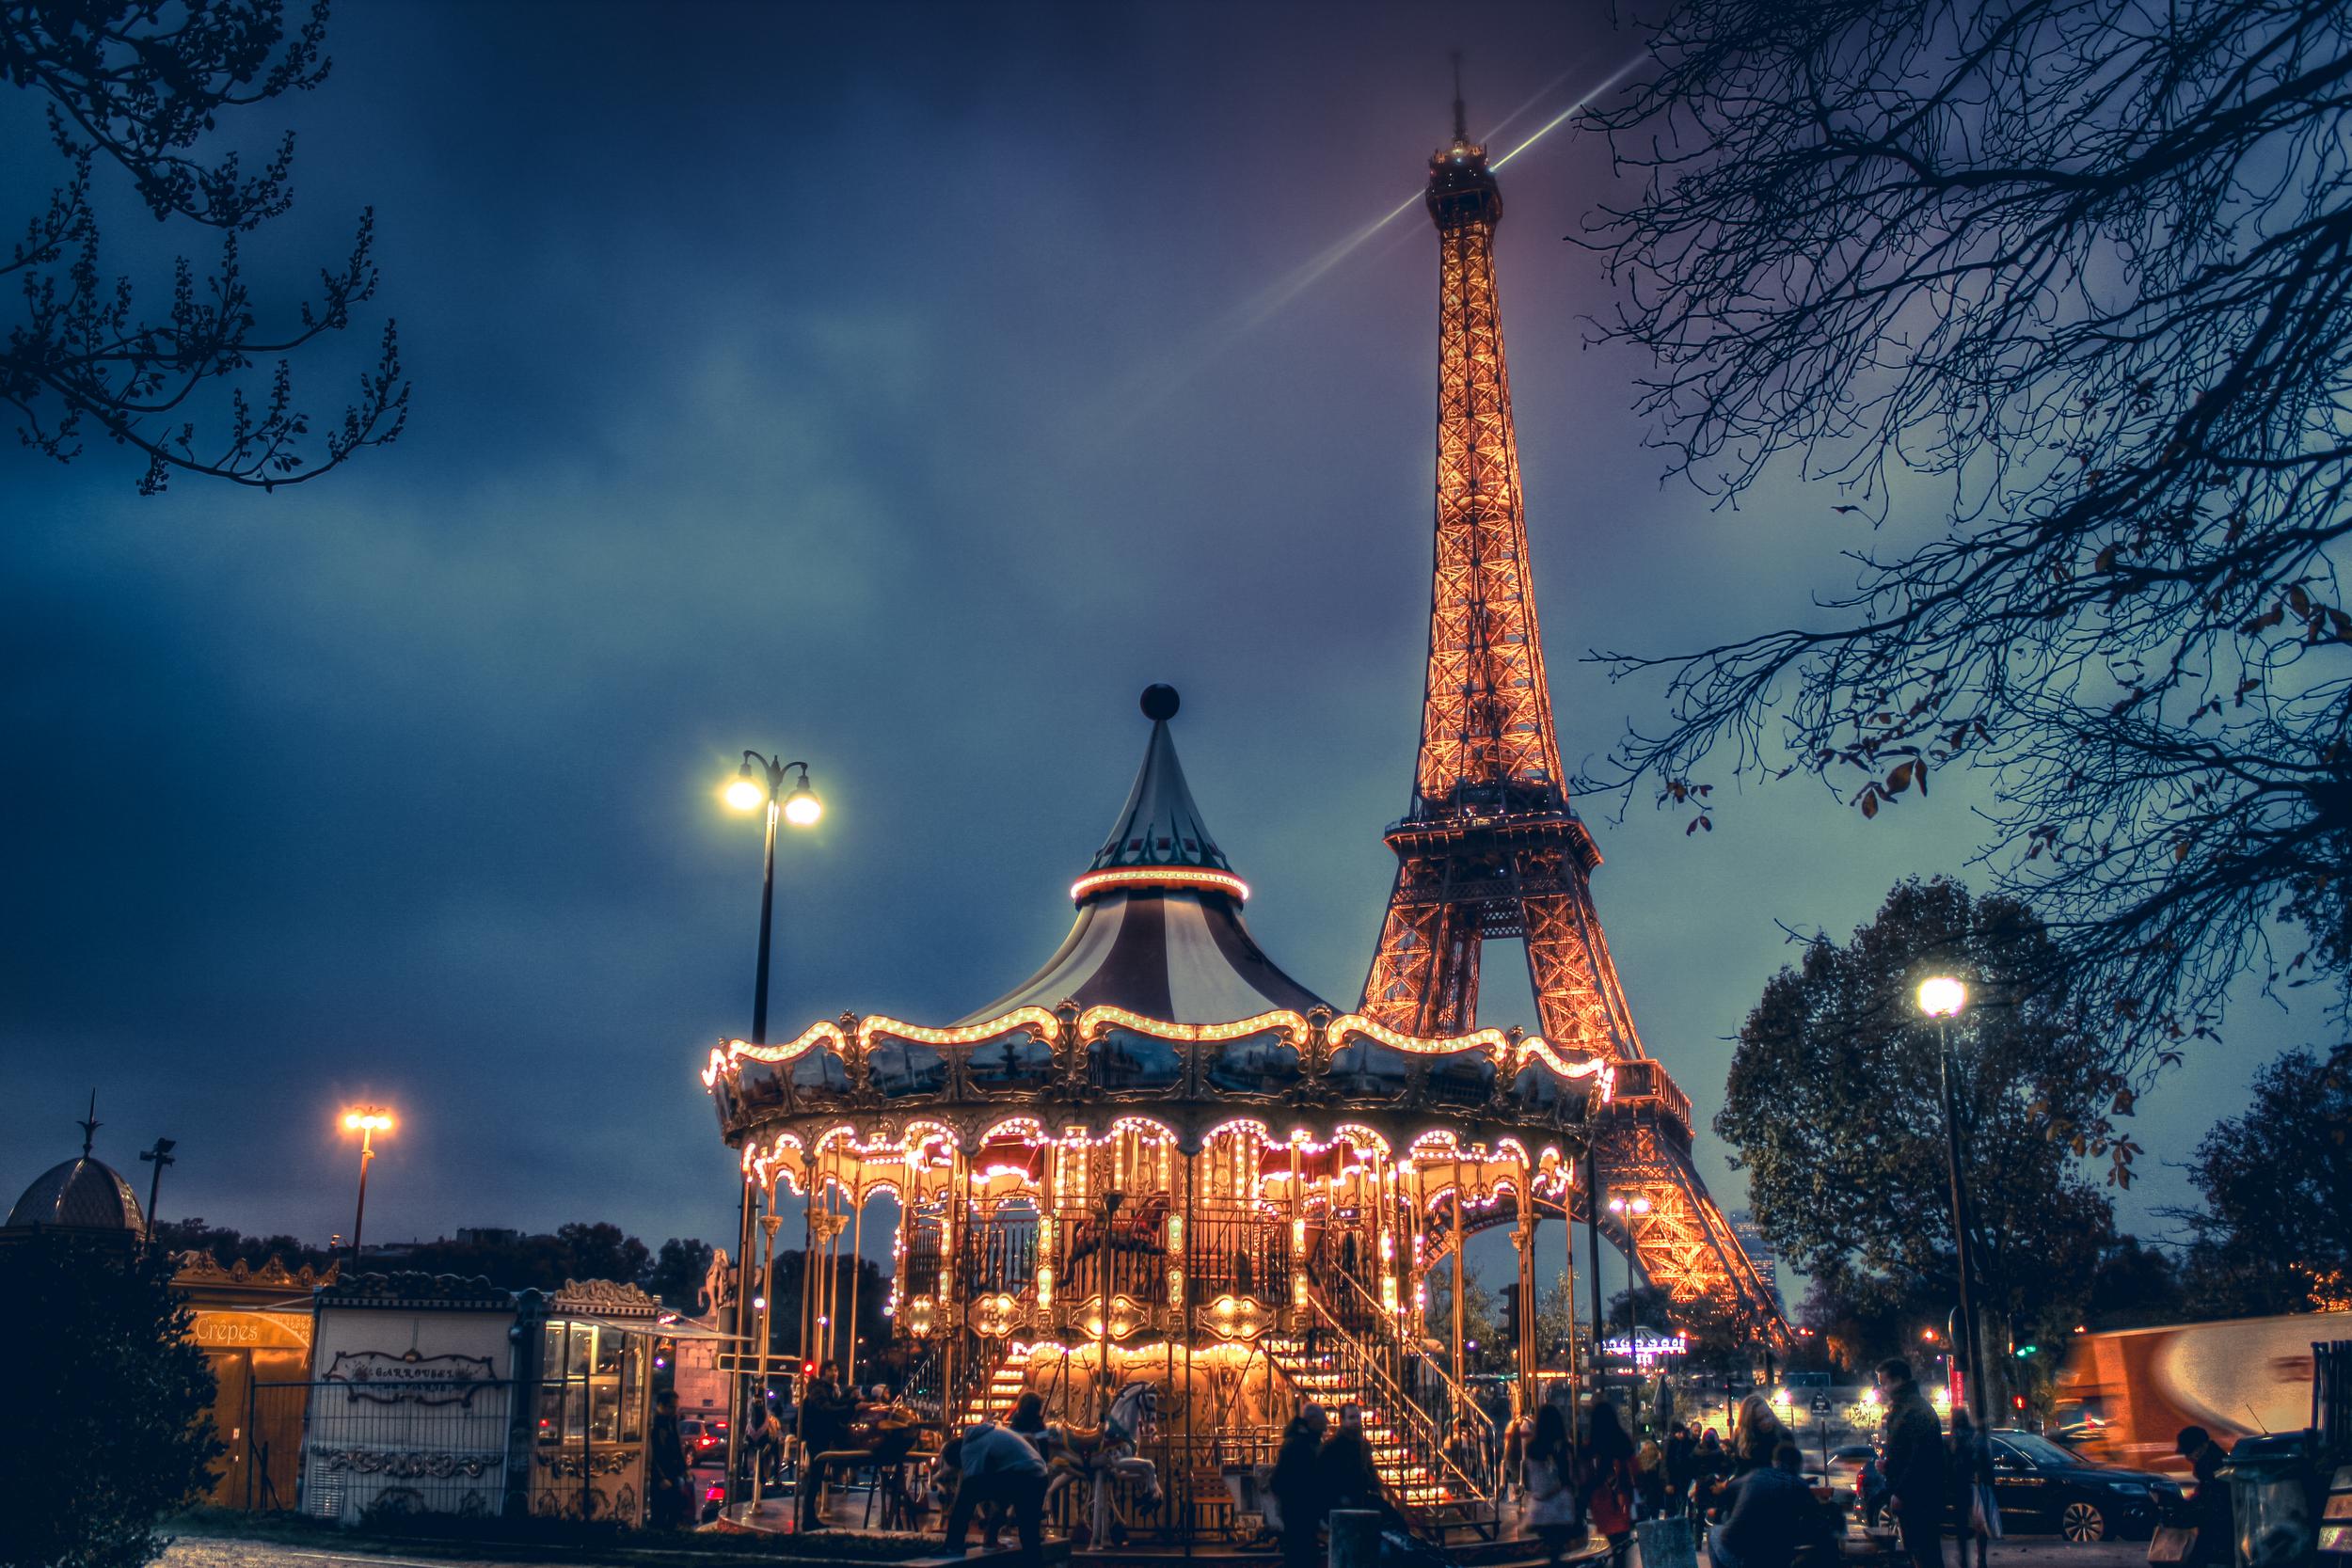 Eiffel Tower Carousel Paris France Europe Eric Bravo.jpg